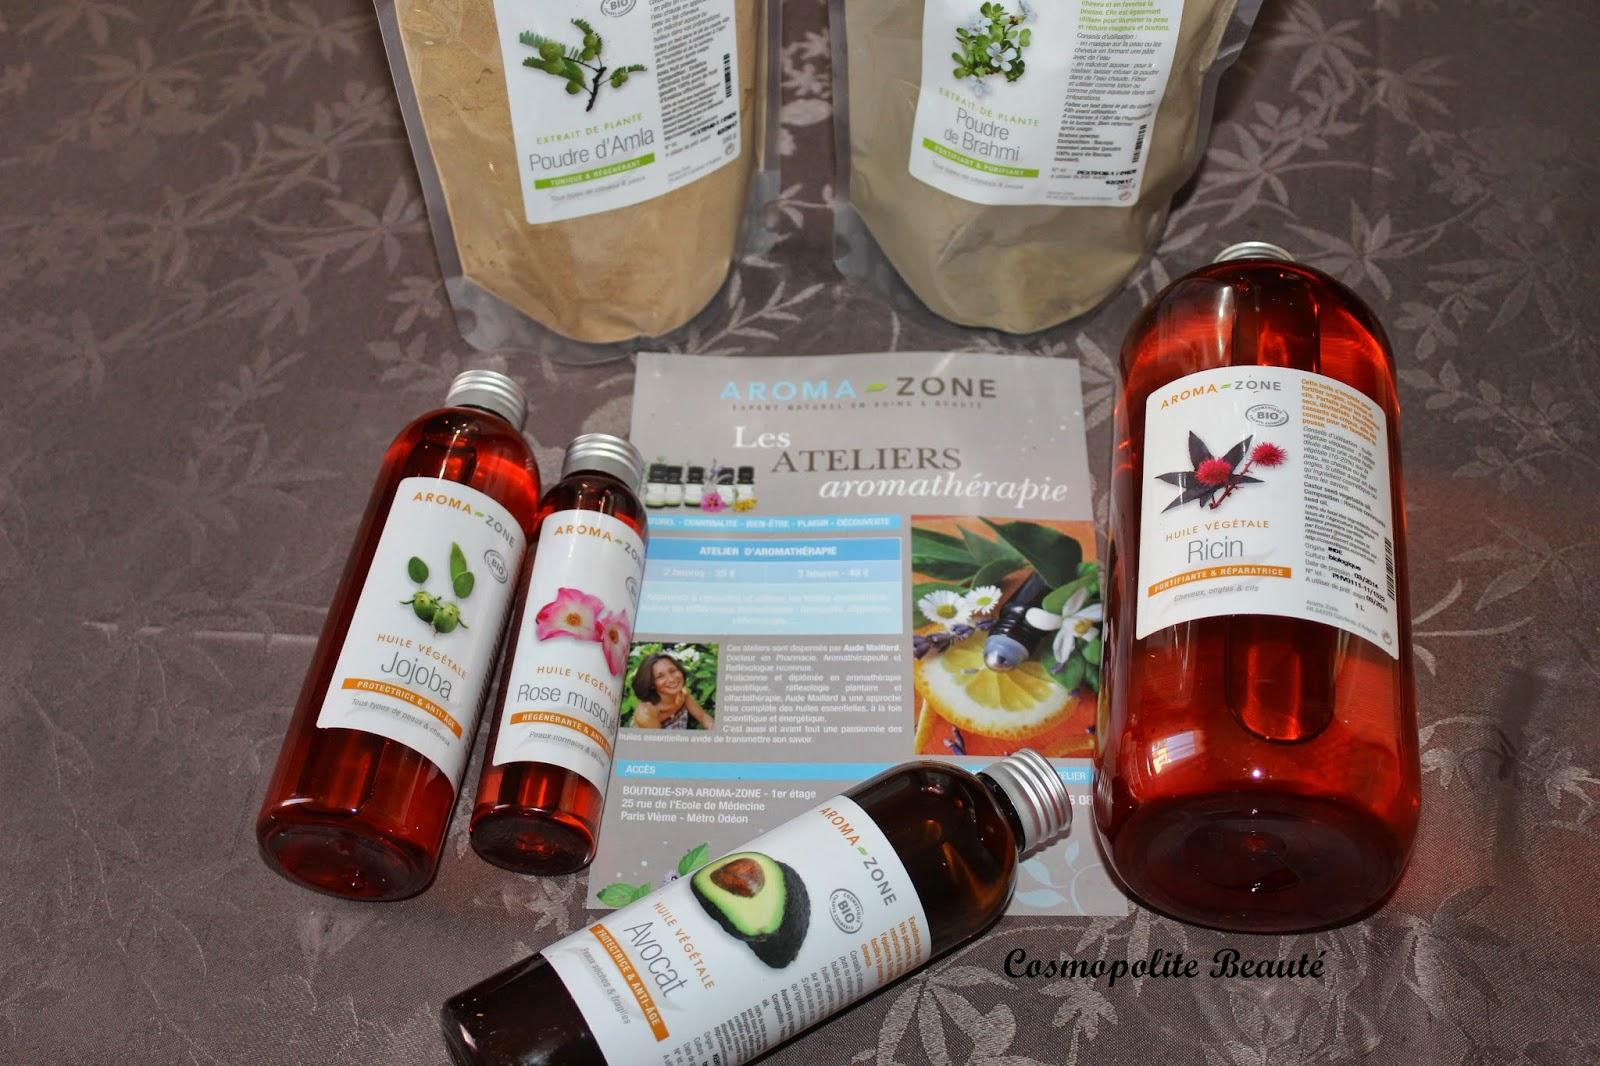 huiles végétales, jojoba, ricin, avocat, rose musquée, aroma-zone